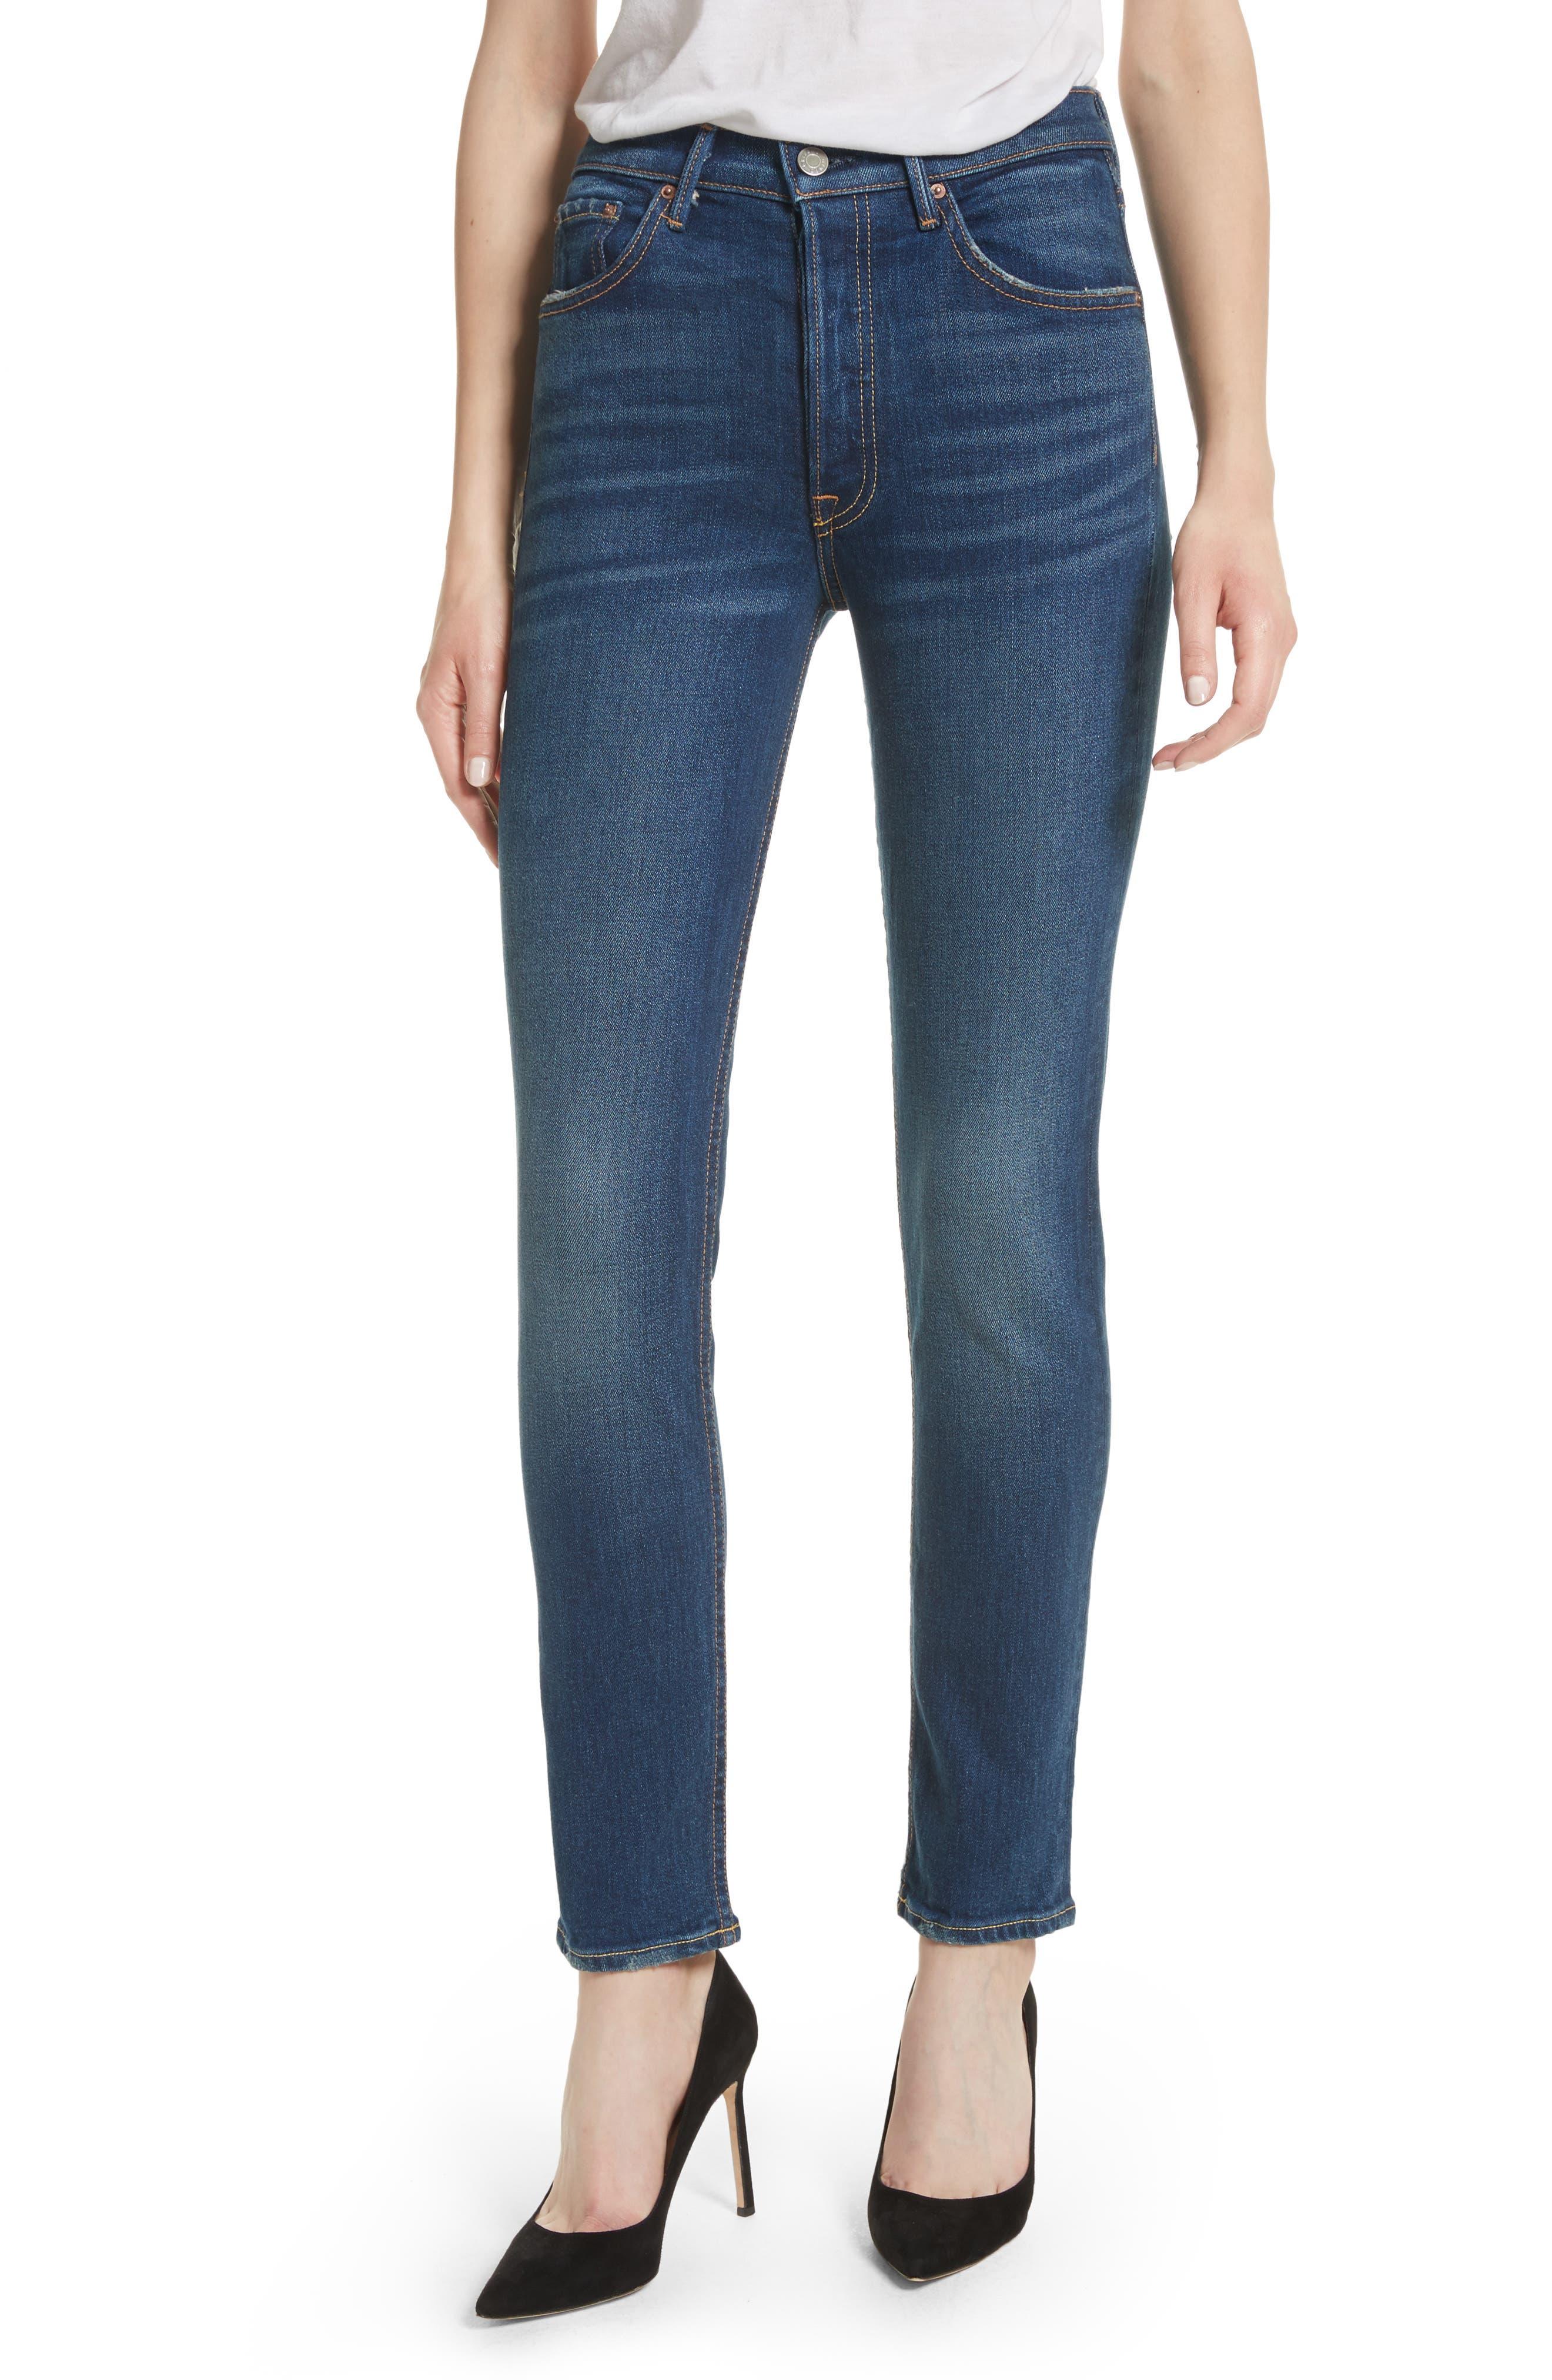 Karolina High Waist Skinny Jeans,                         Main,                         color, JOAN JETT